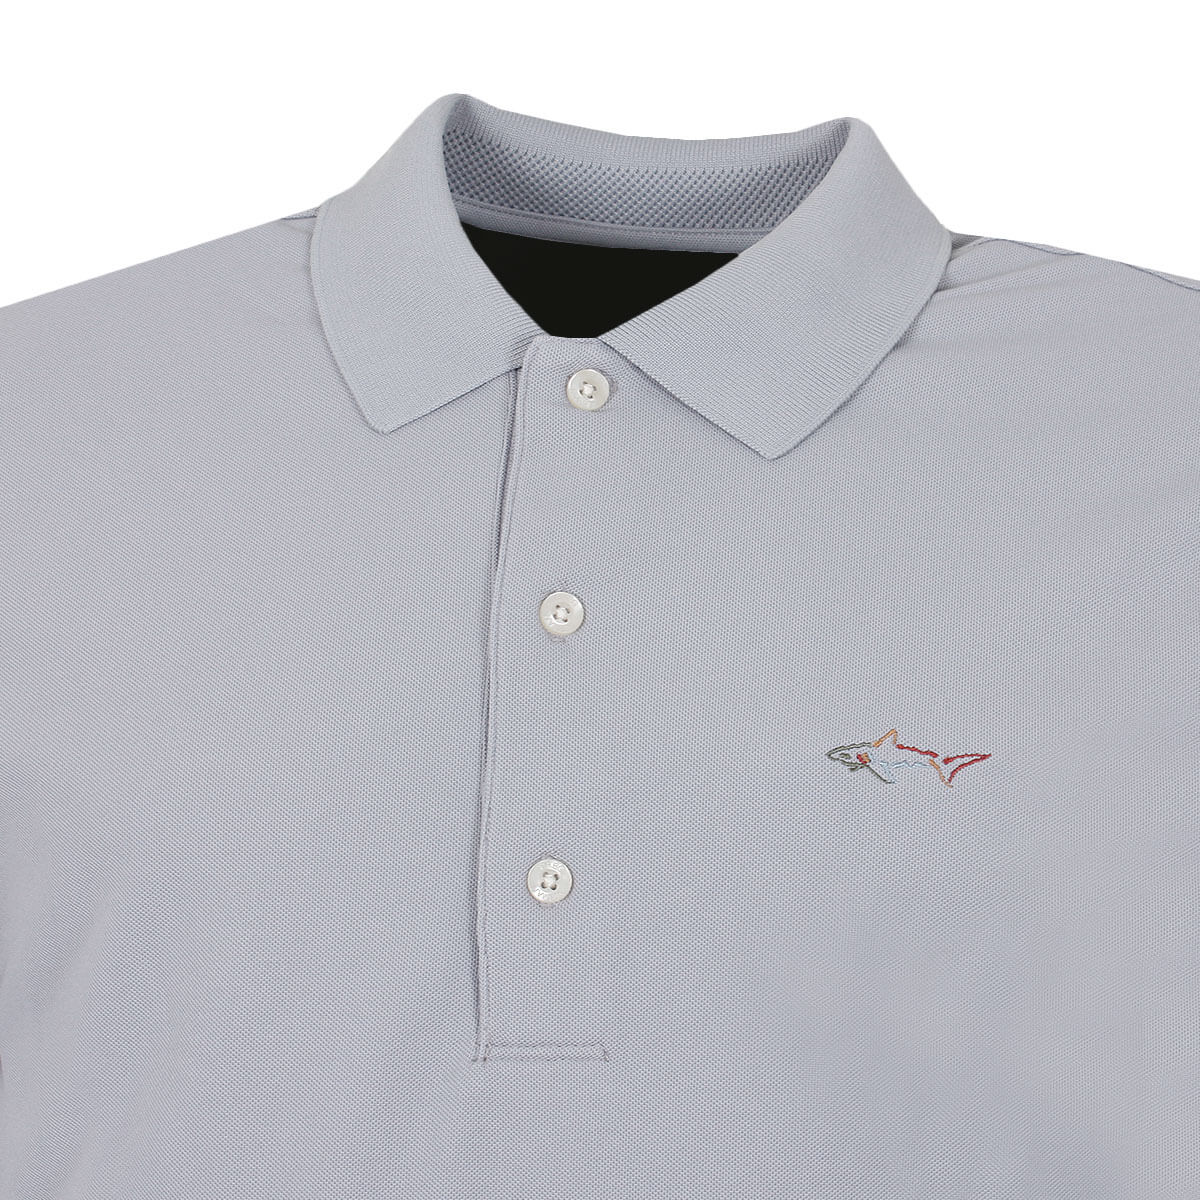 Greg-Norman-Mens-KX04-Performance-Micro-Pique-Golf-Polo-Shirt-28-OFF-RRP thumbnail 72